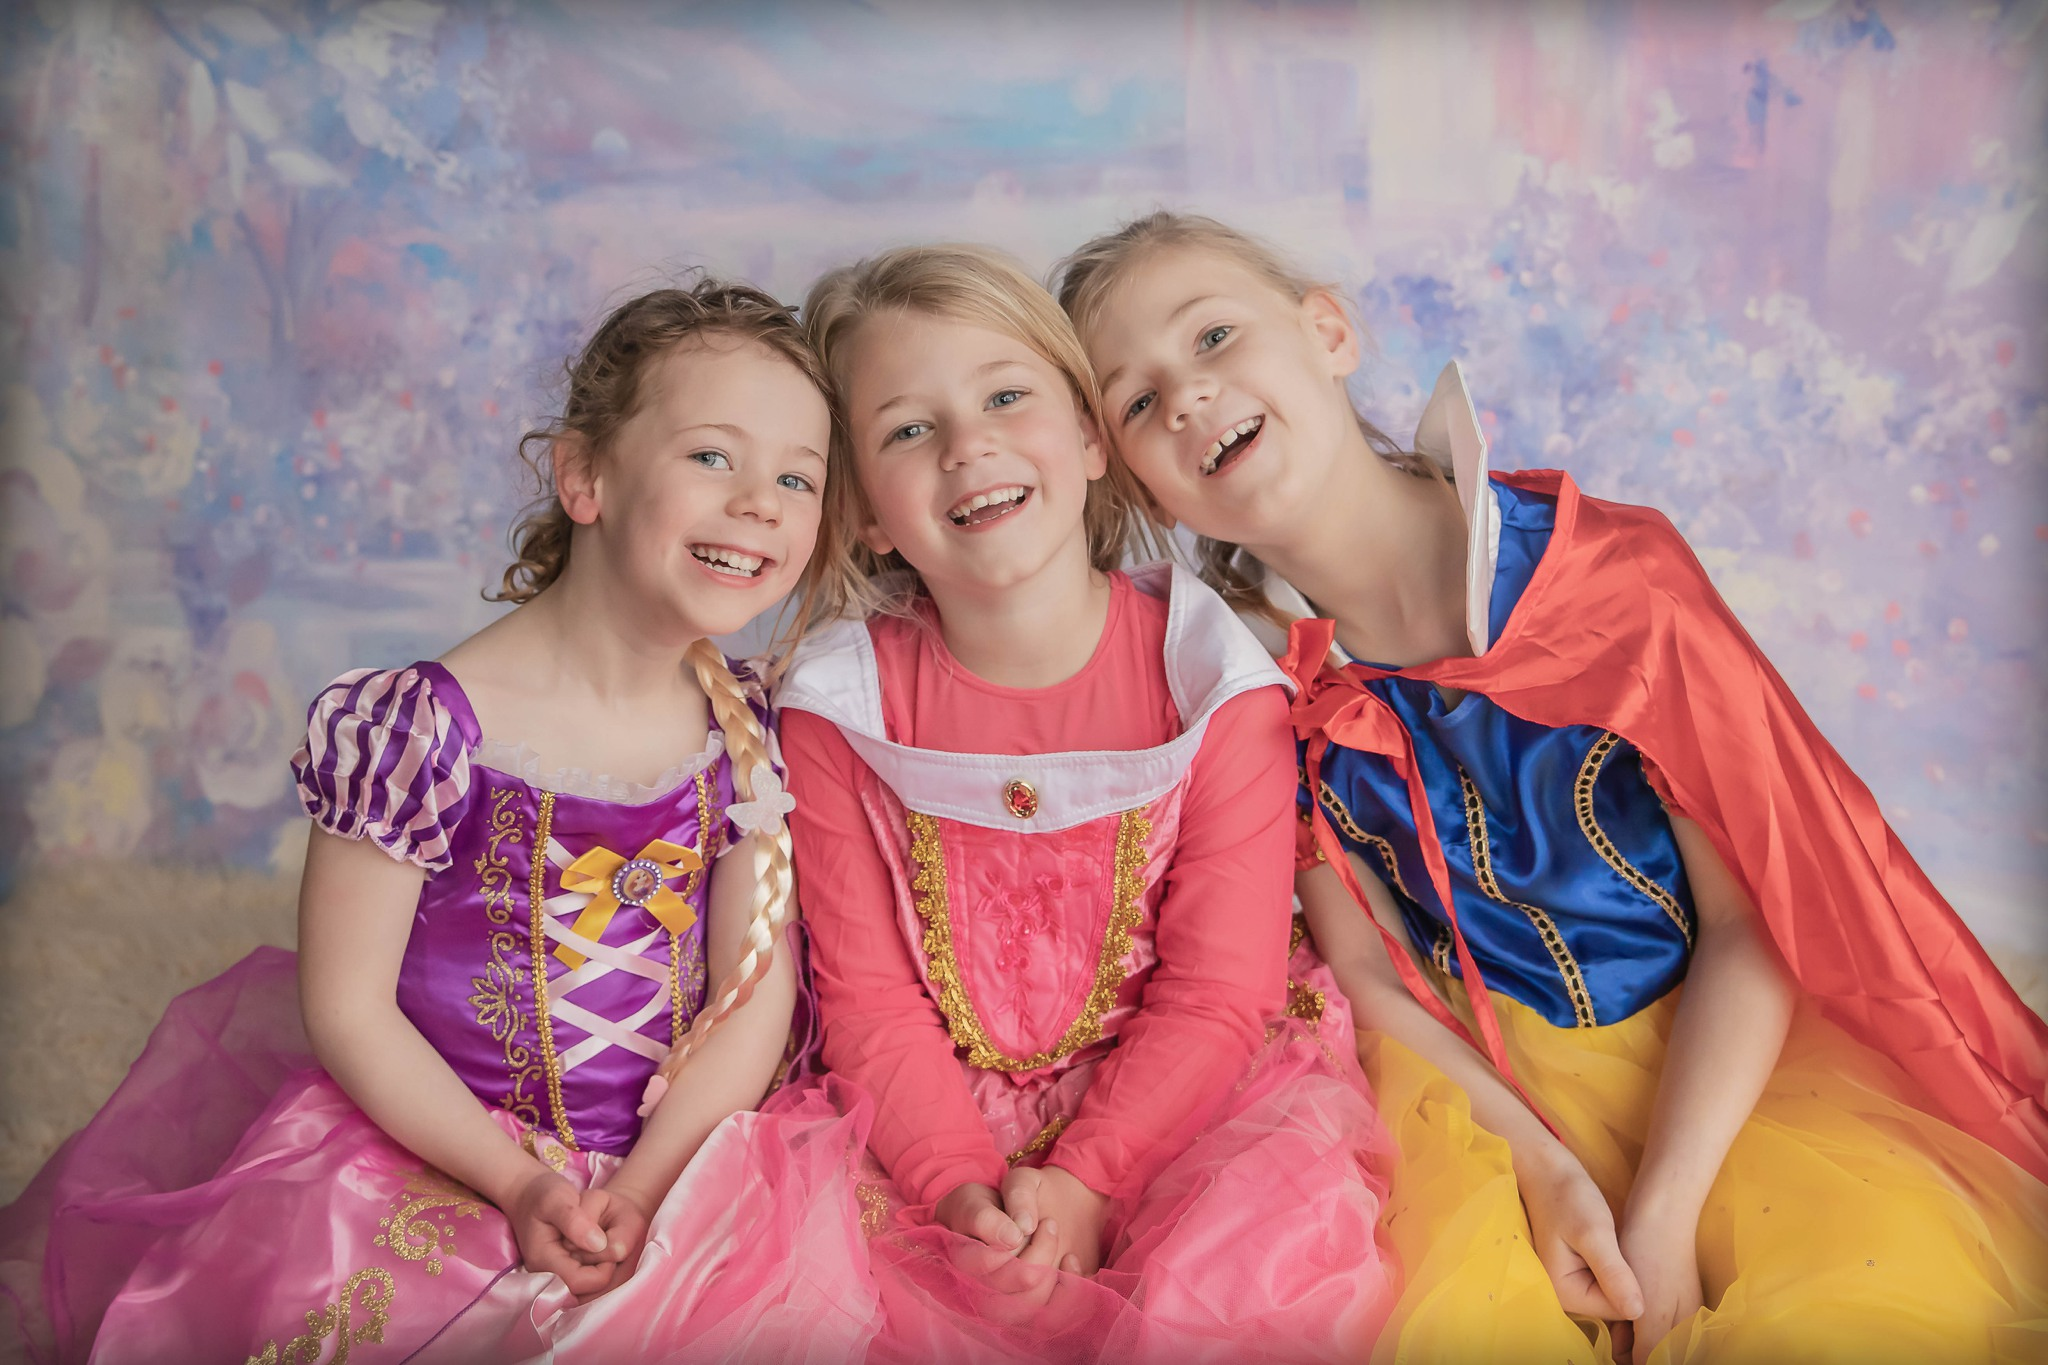 Canberra Family Baby Portrait Children Photographer (3 of 6)-2_WEB.jpg